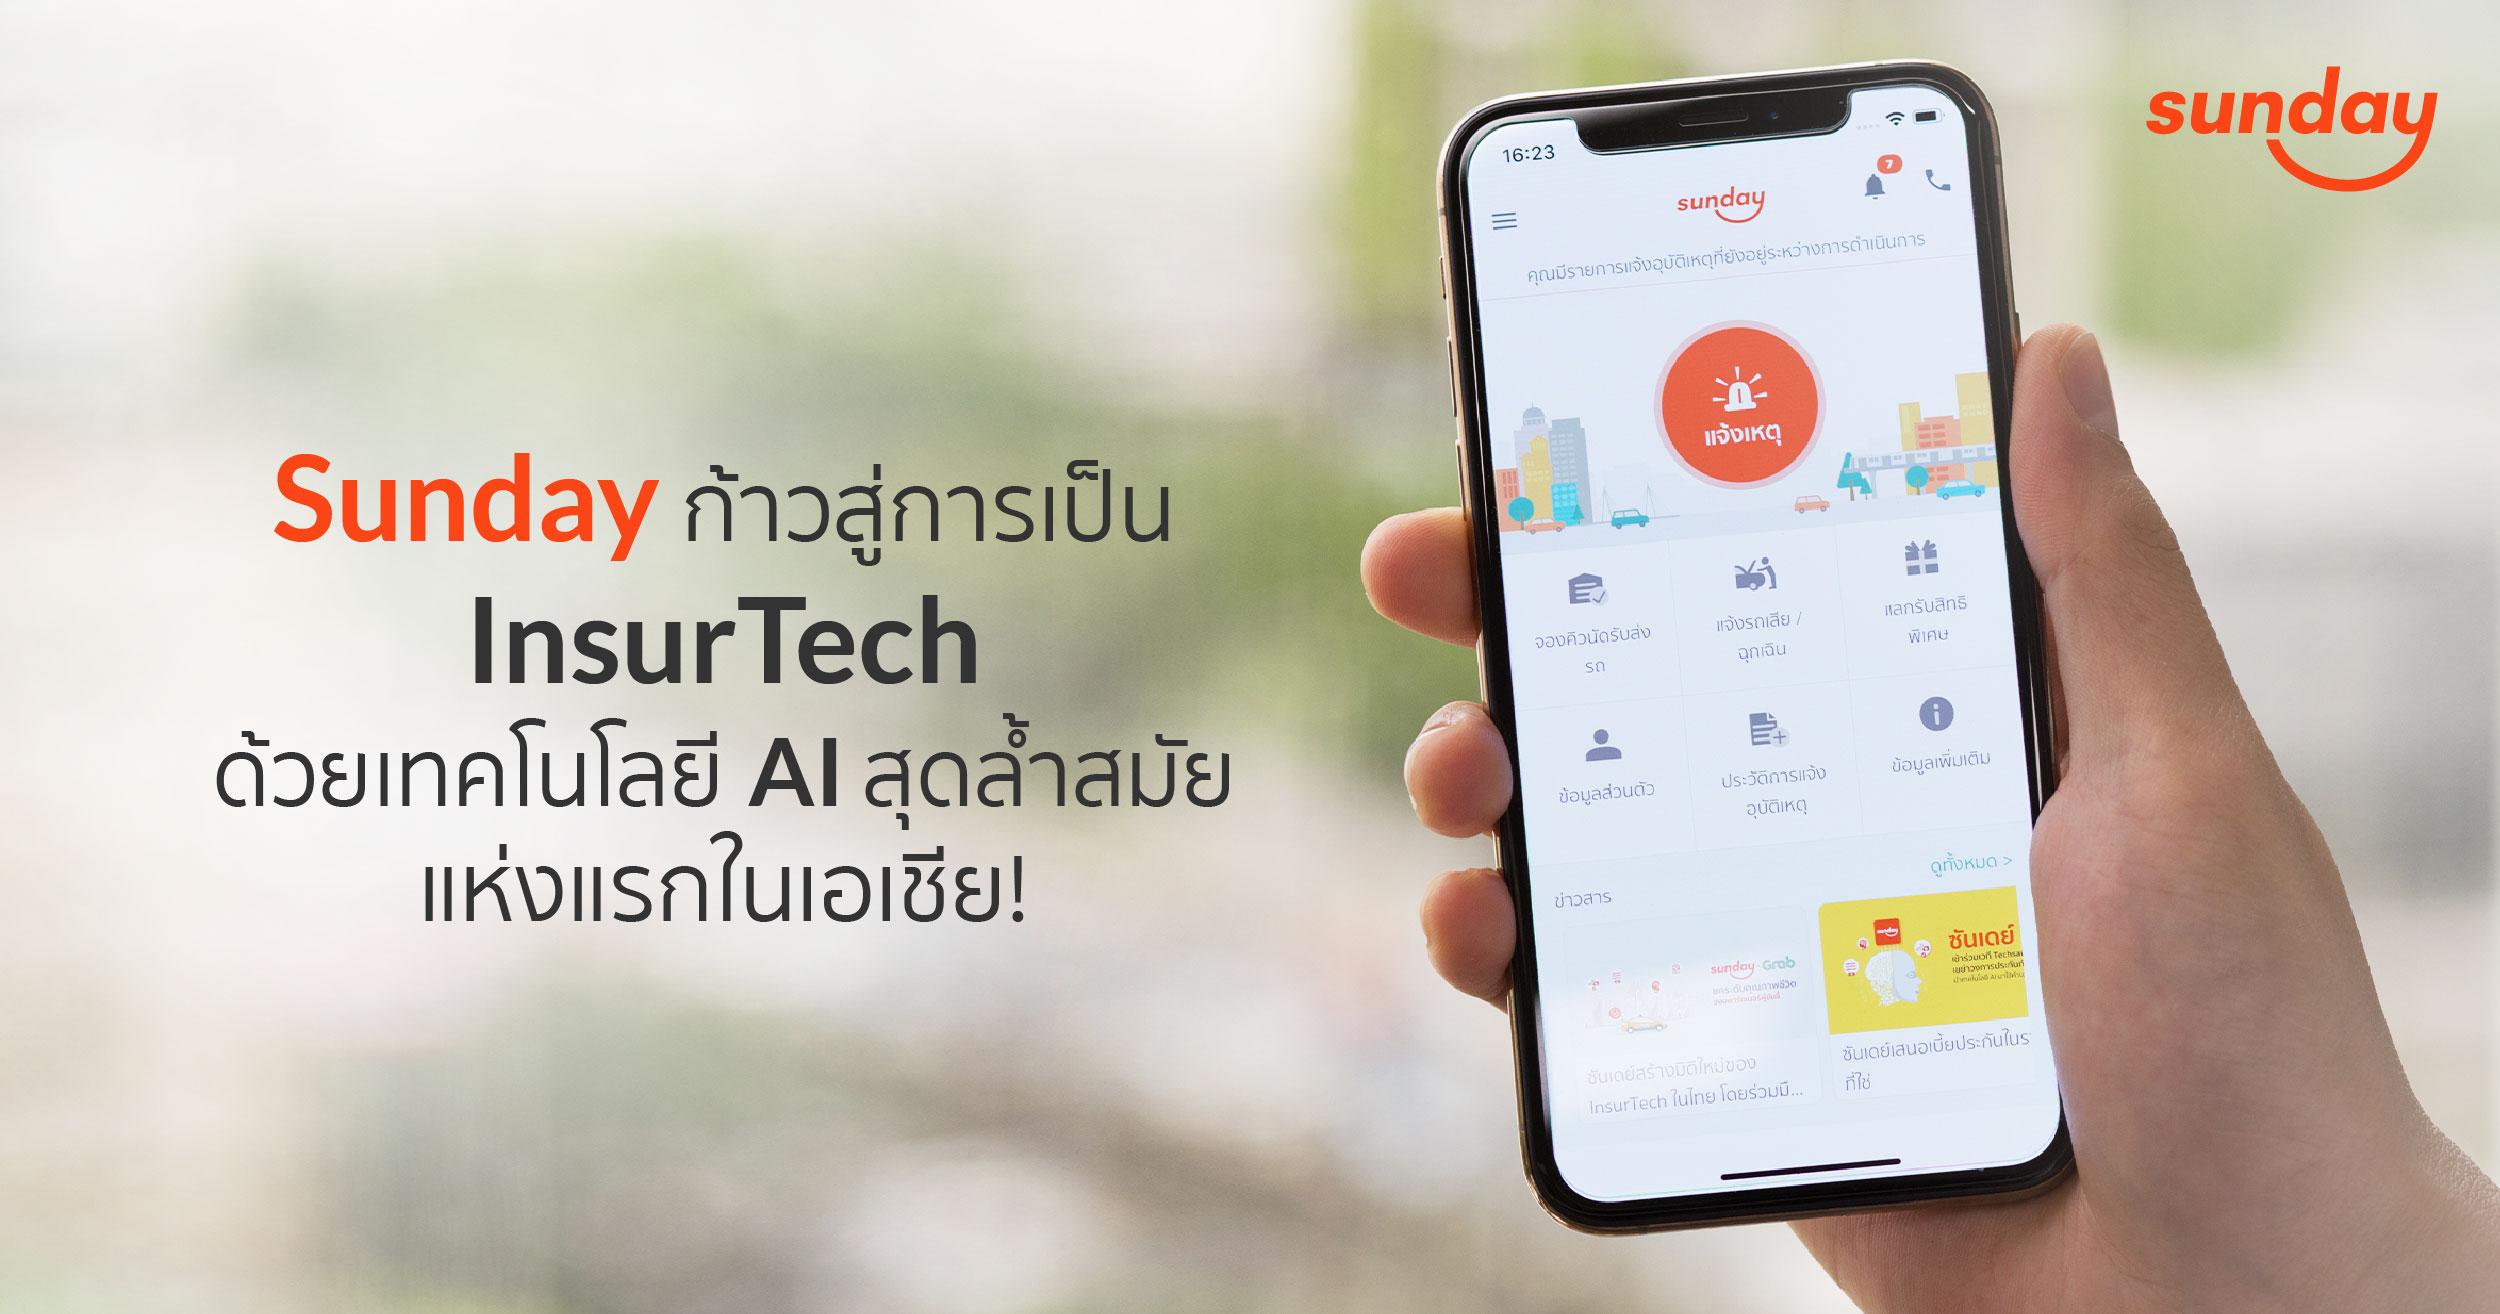 Sunday ก้าวสู่การเป็น InsurTech อย่างแท้จริง ด้วยเทคโนโลยี AI และ Machine Learning แห่งแรกในเอเชีย